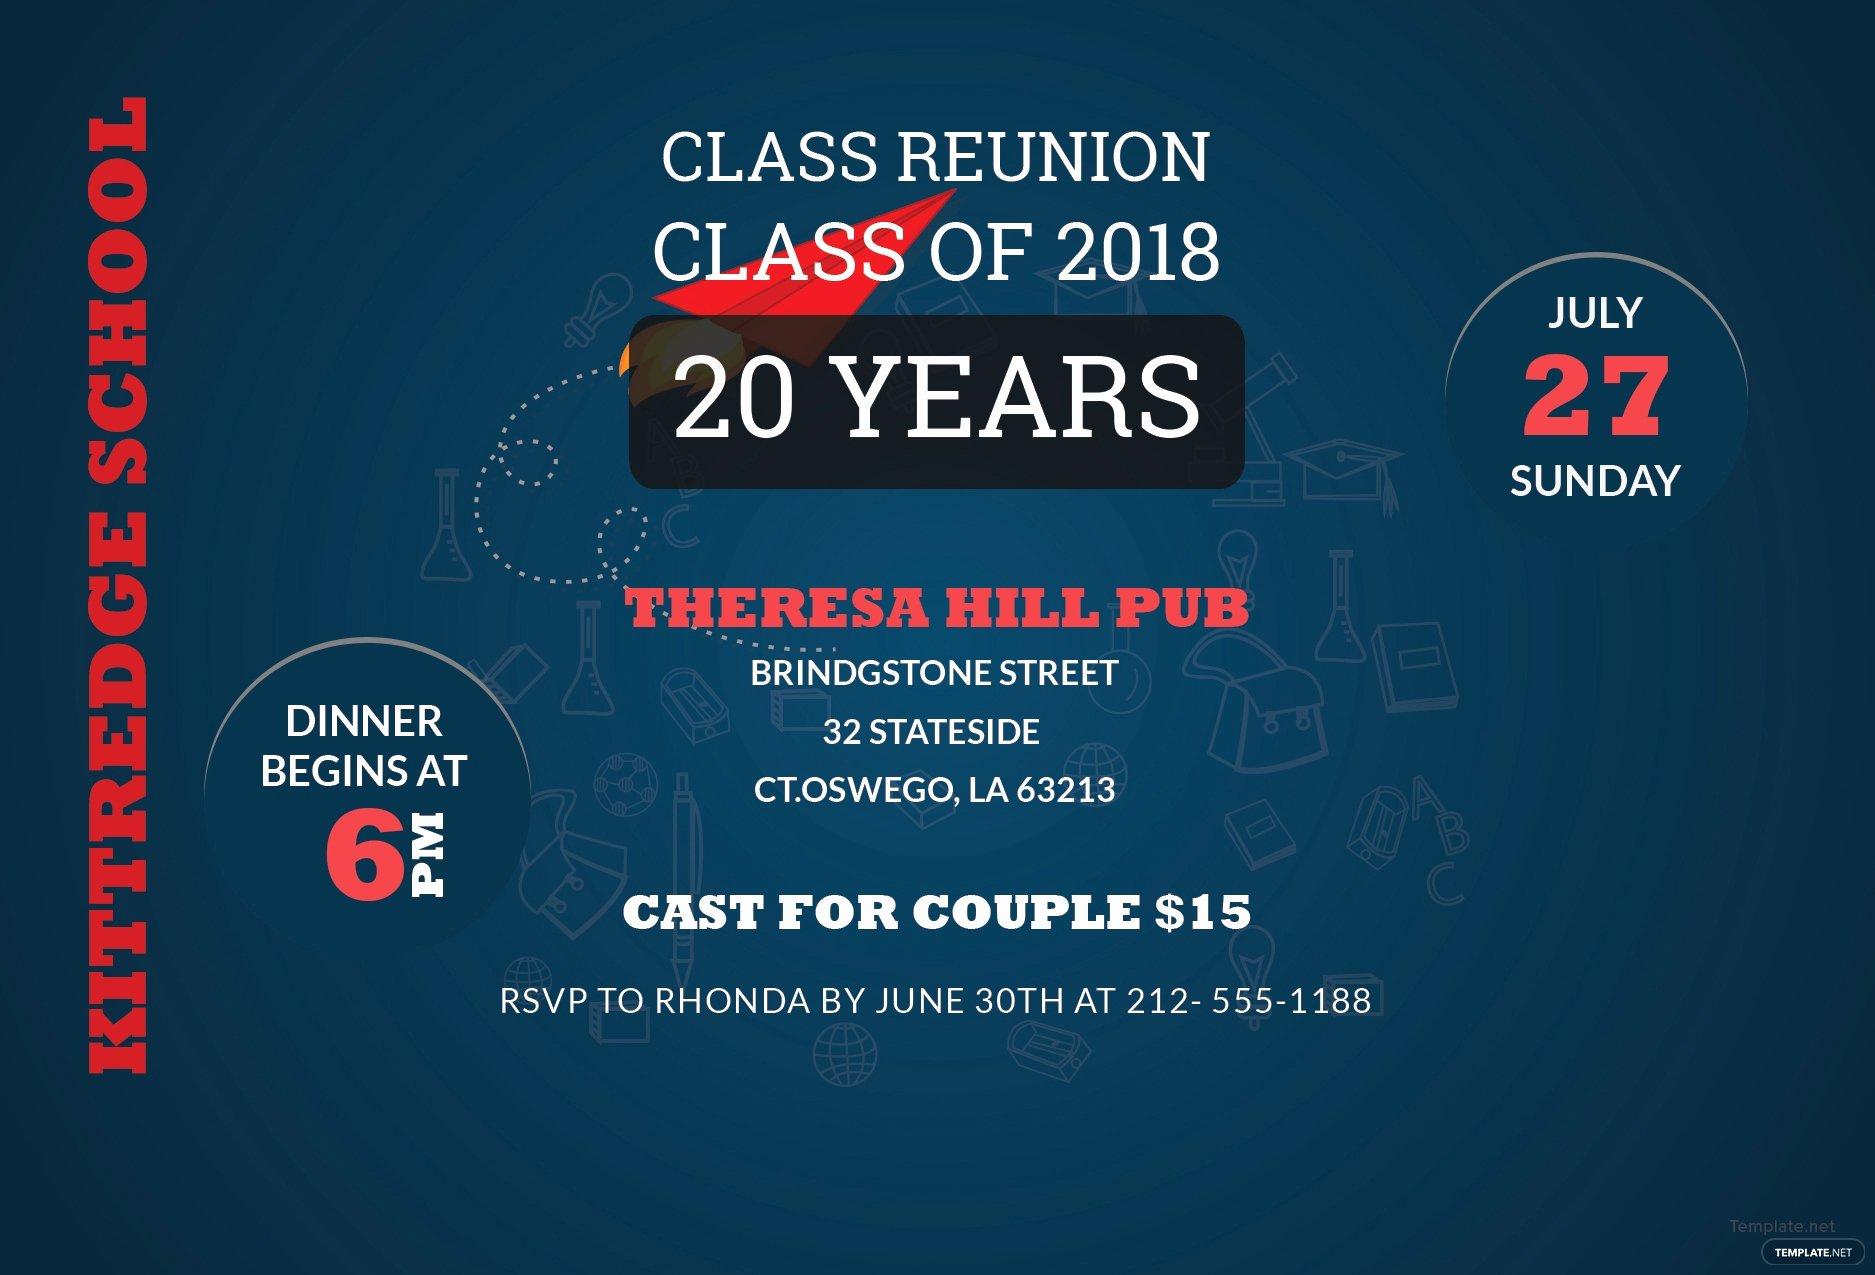 Class Reunion Invitation Template Free New Free Class Reunion Invitation Template In Adobe Shop